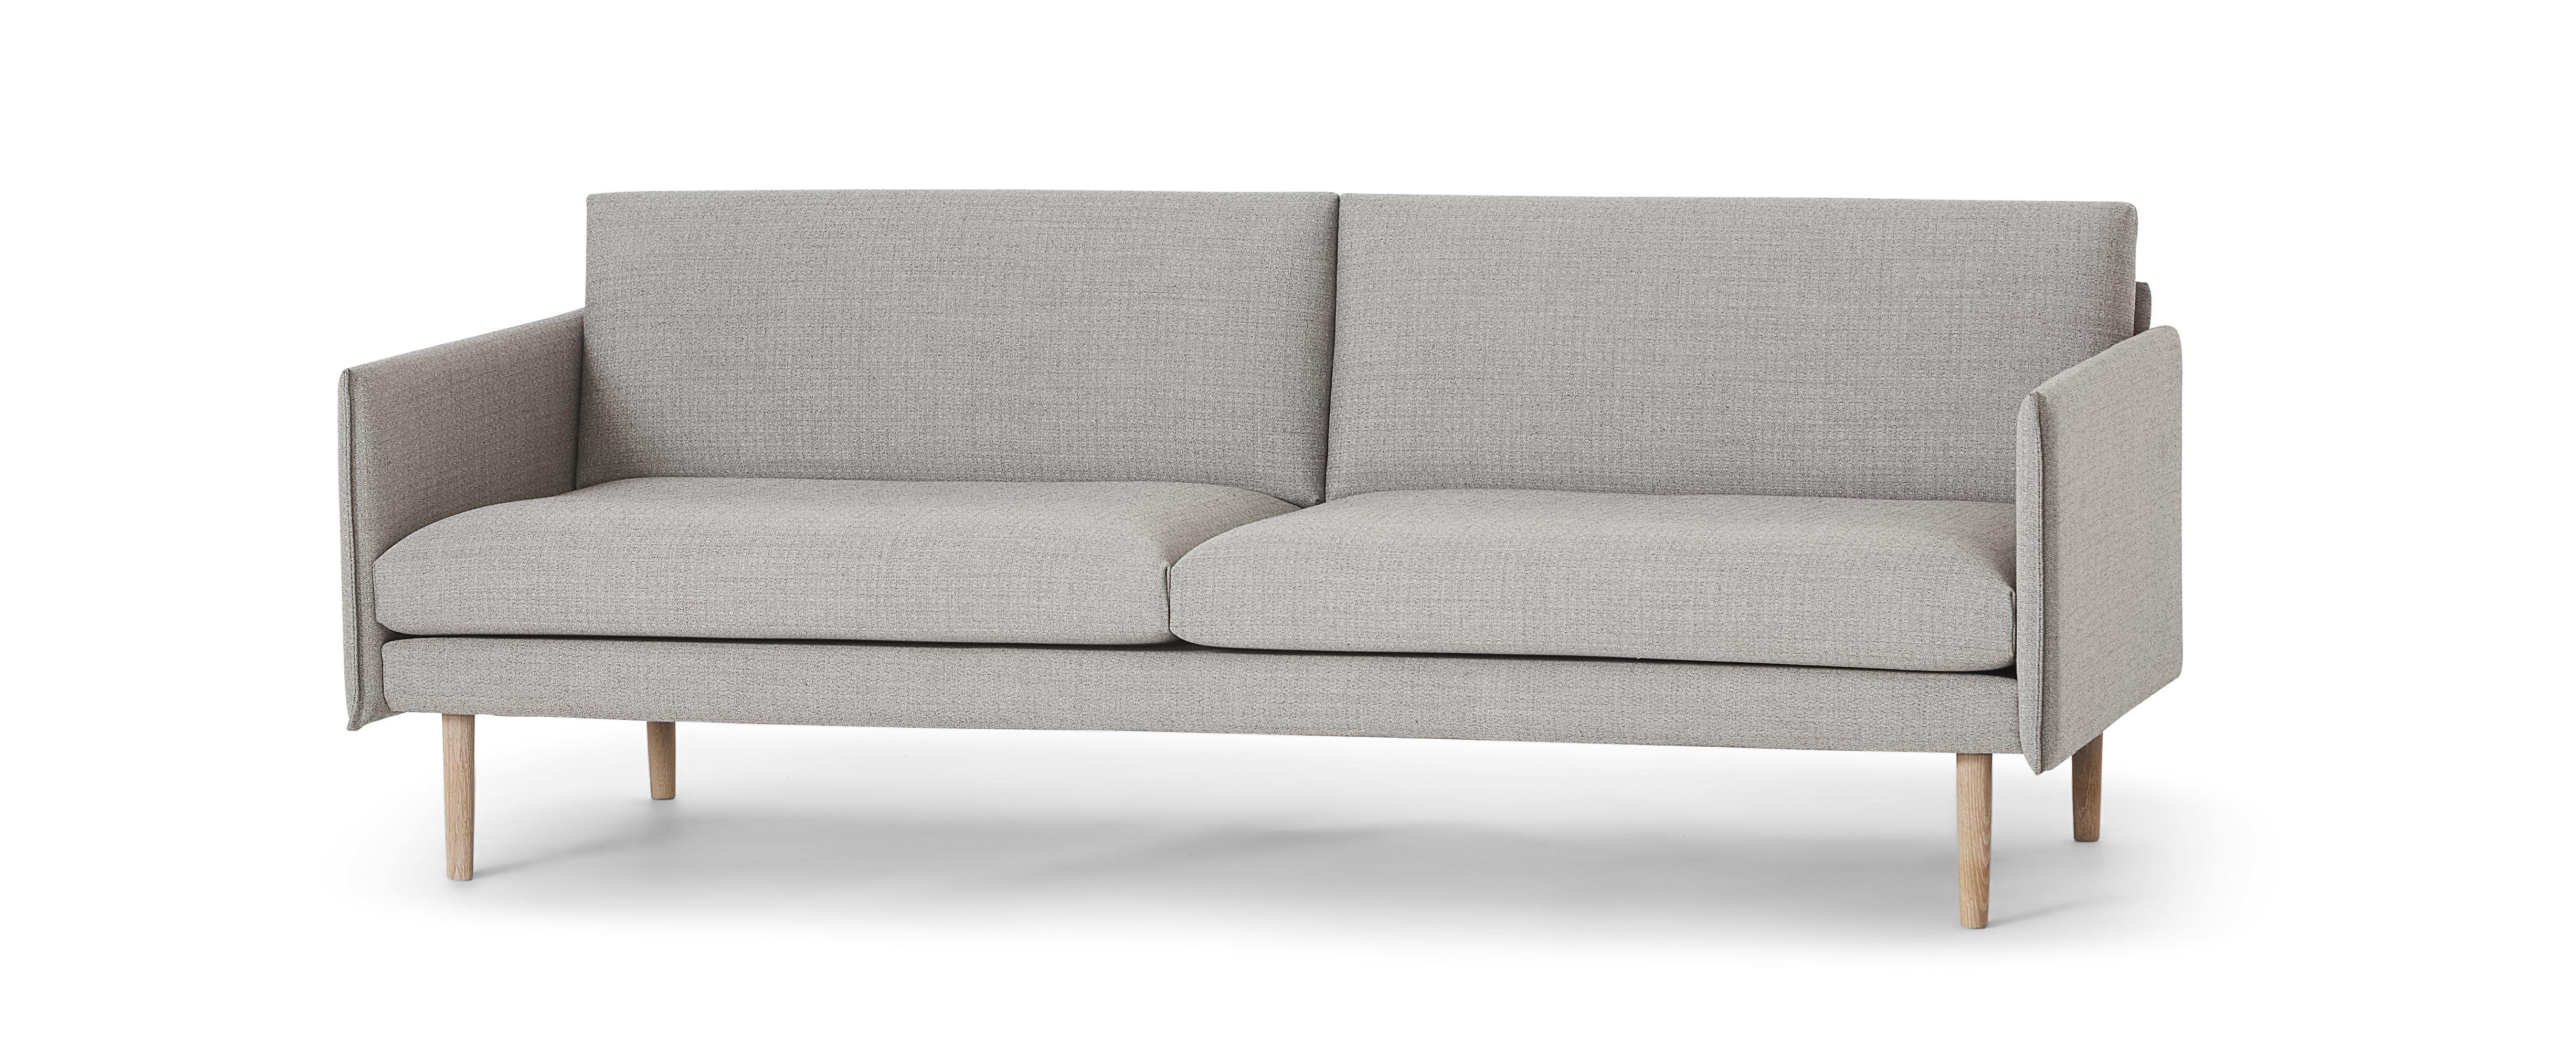 Form Sofa Sofa Furniture Sofa Danish Furniture